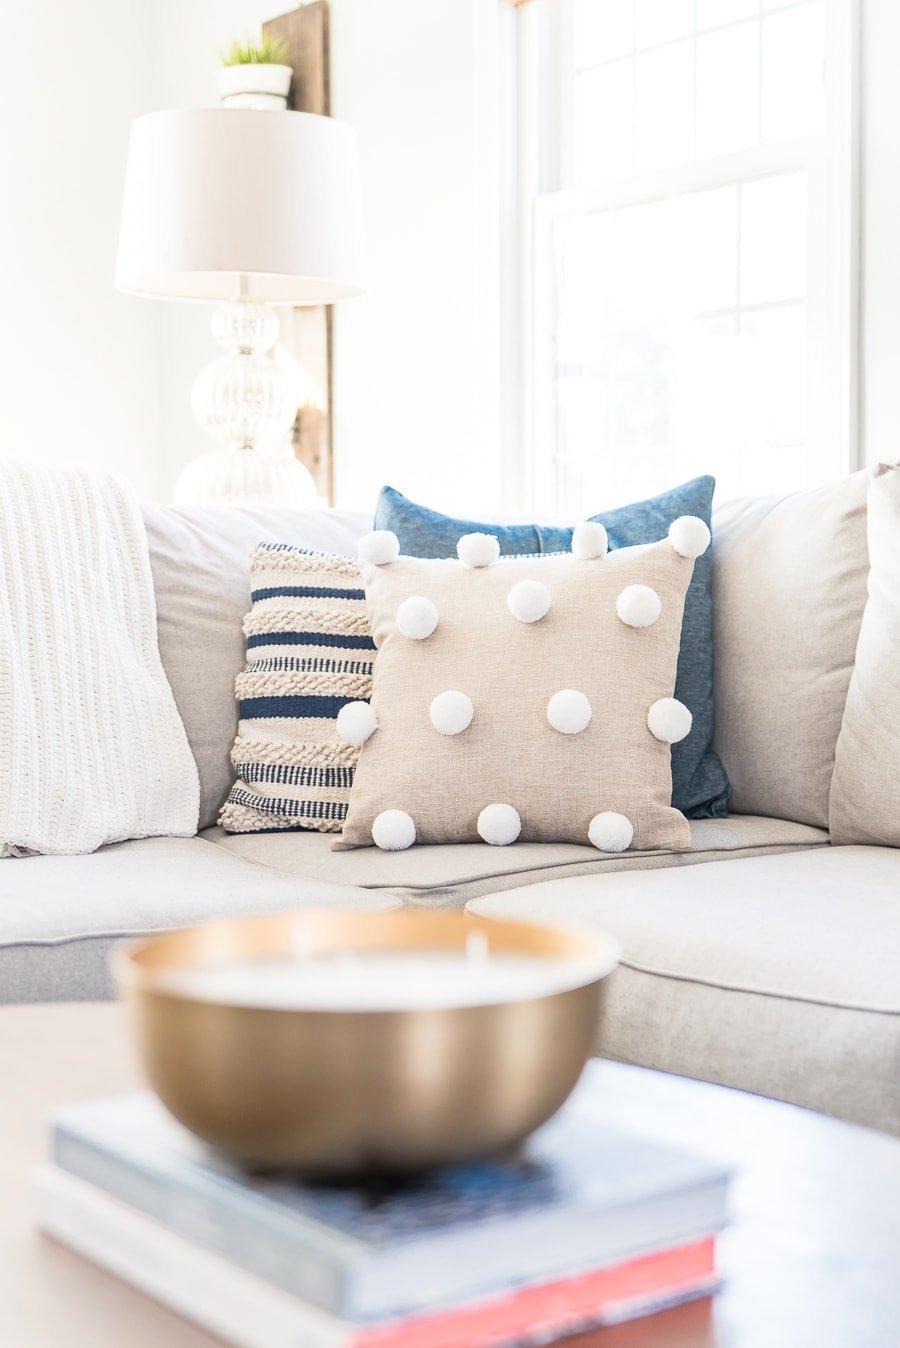 DIY pom pom pillow in couch